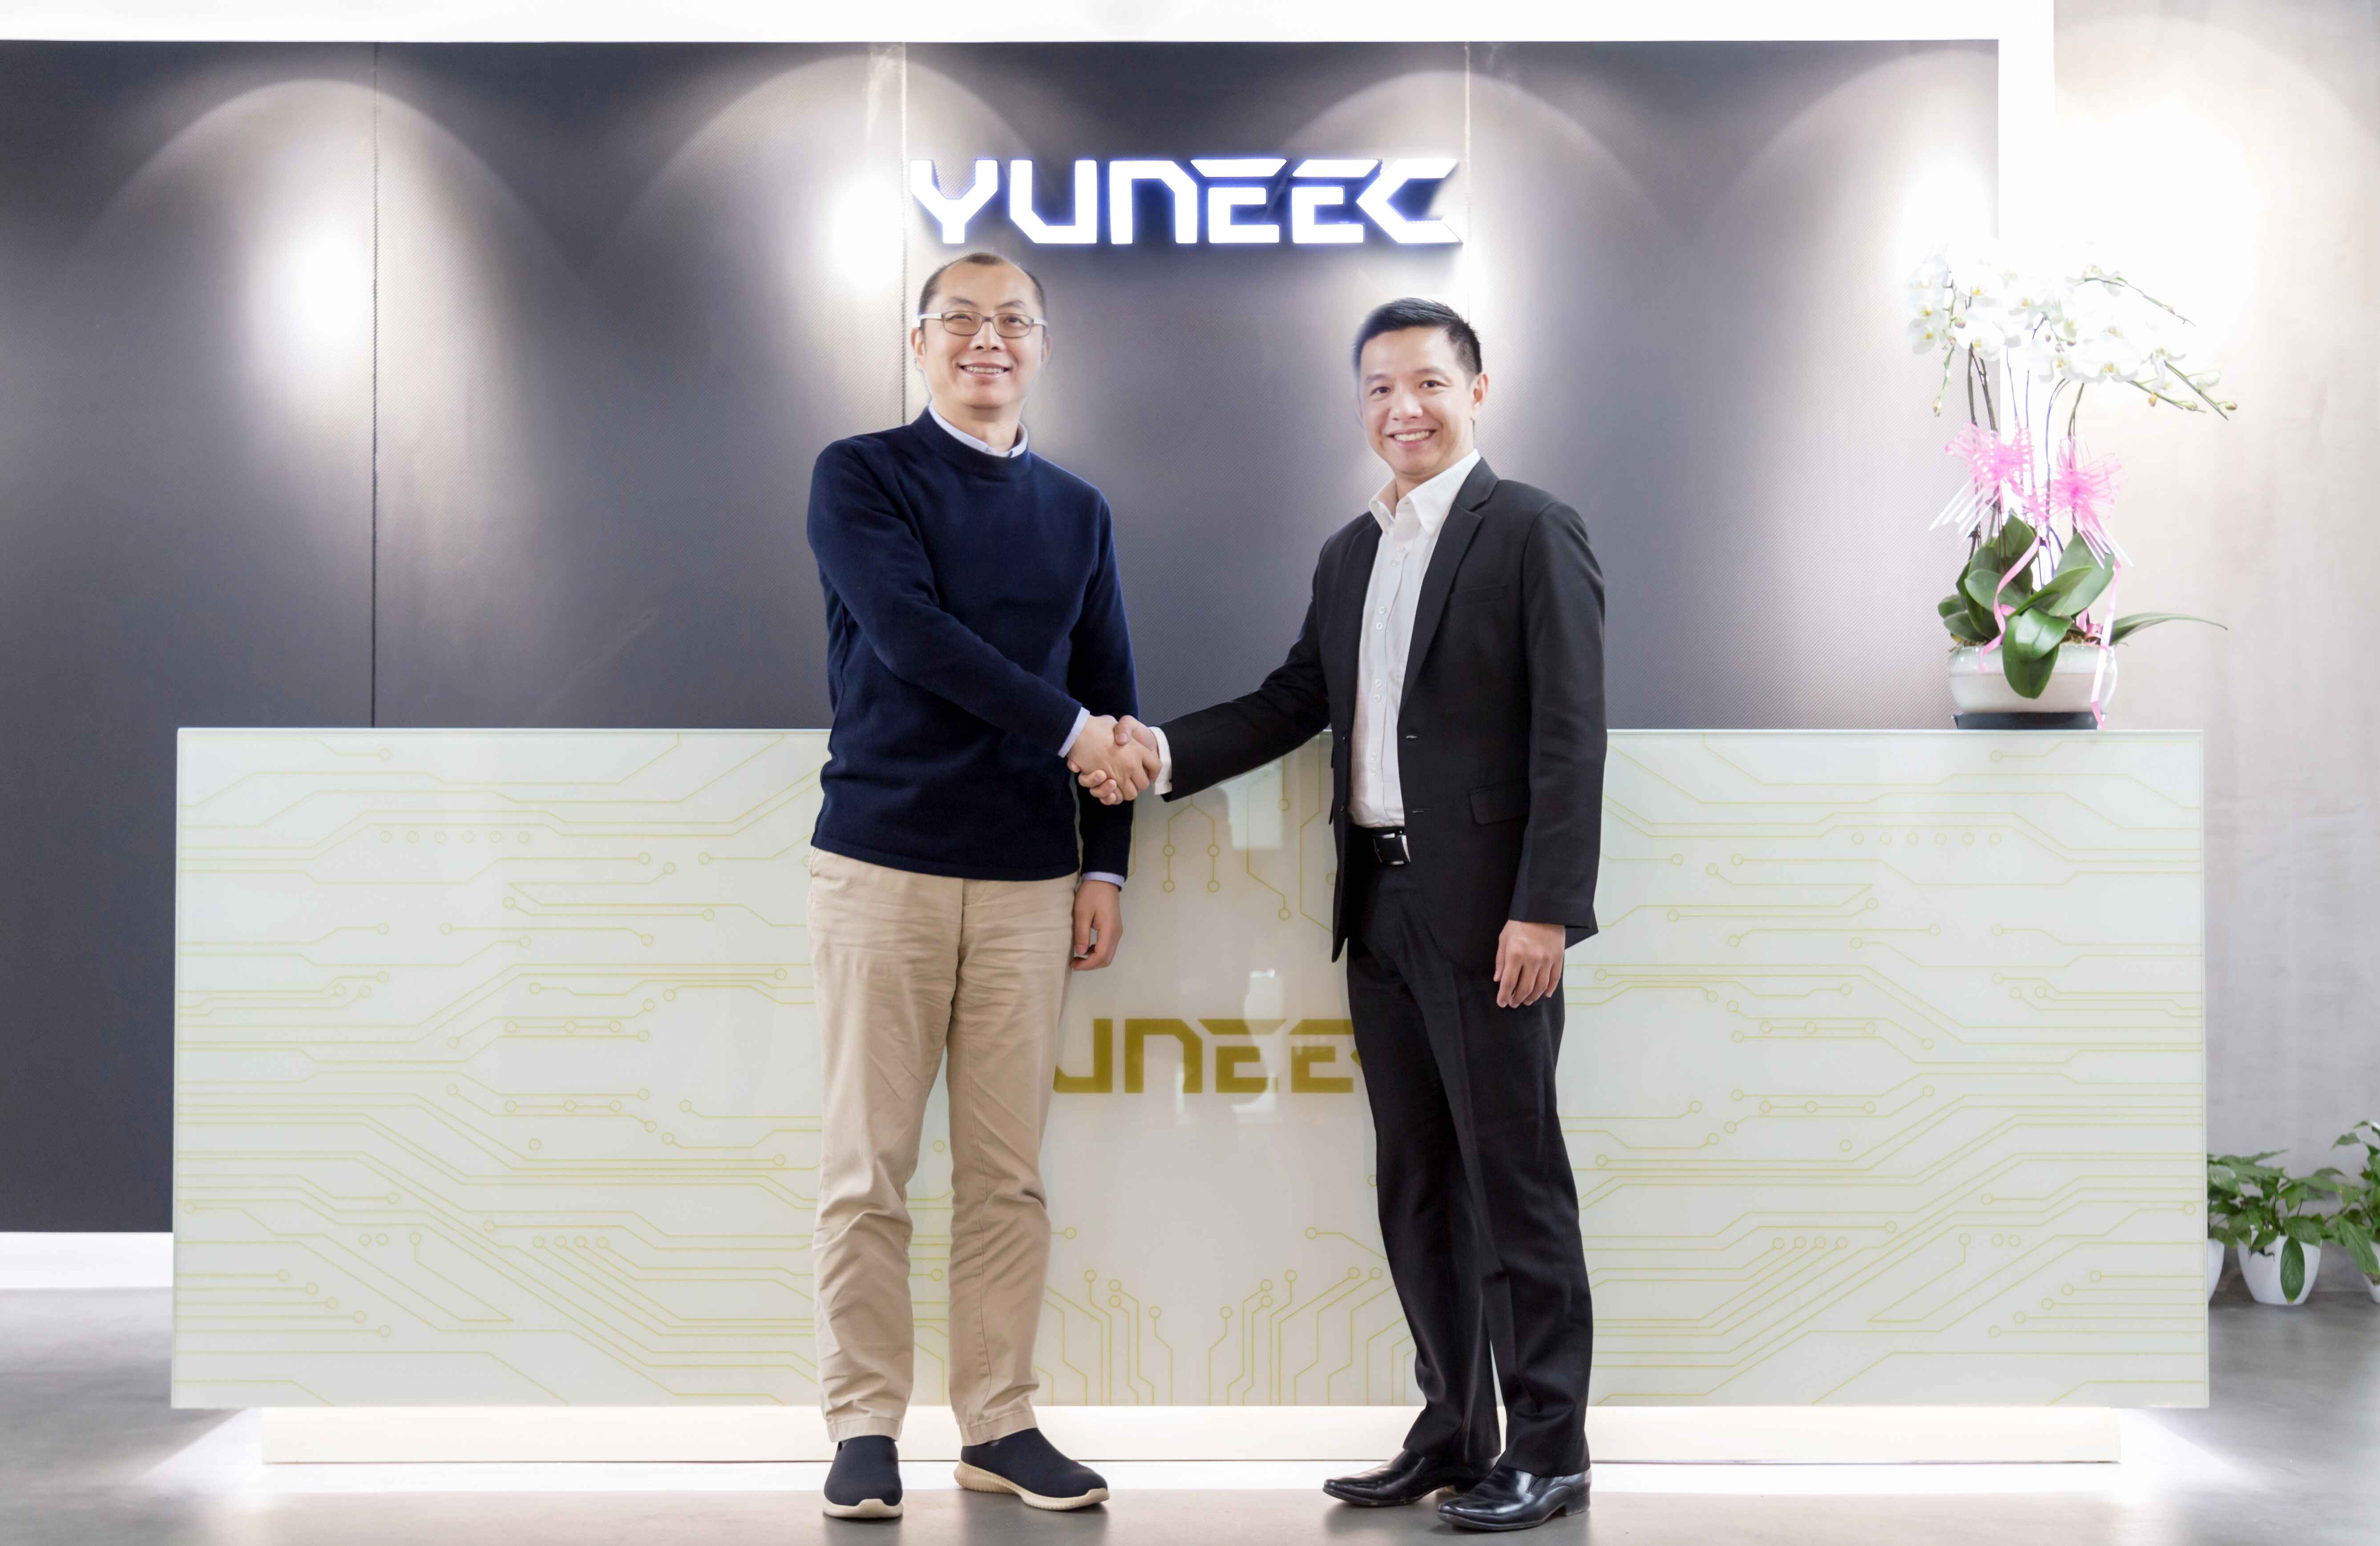 20190305021344516 - Hi-Target International Group Limited and Yuneec International Formed a Strategic Partnership Alliance to Provide Comprehensive UAV Solutions